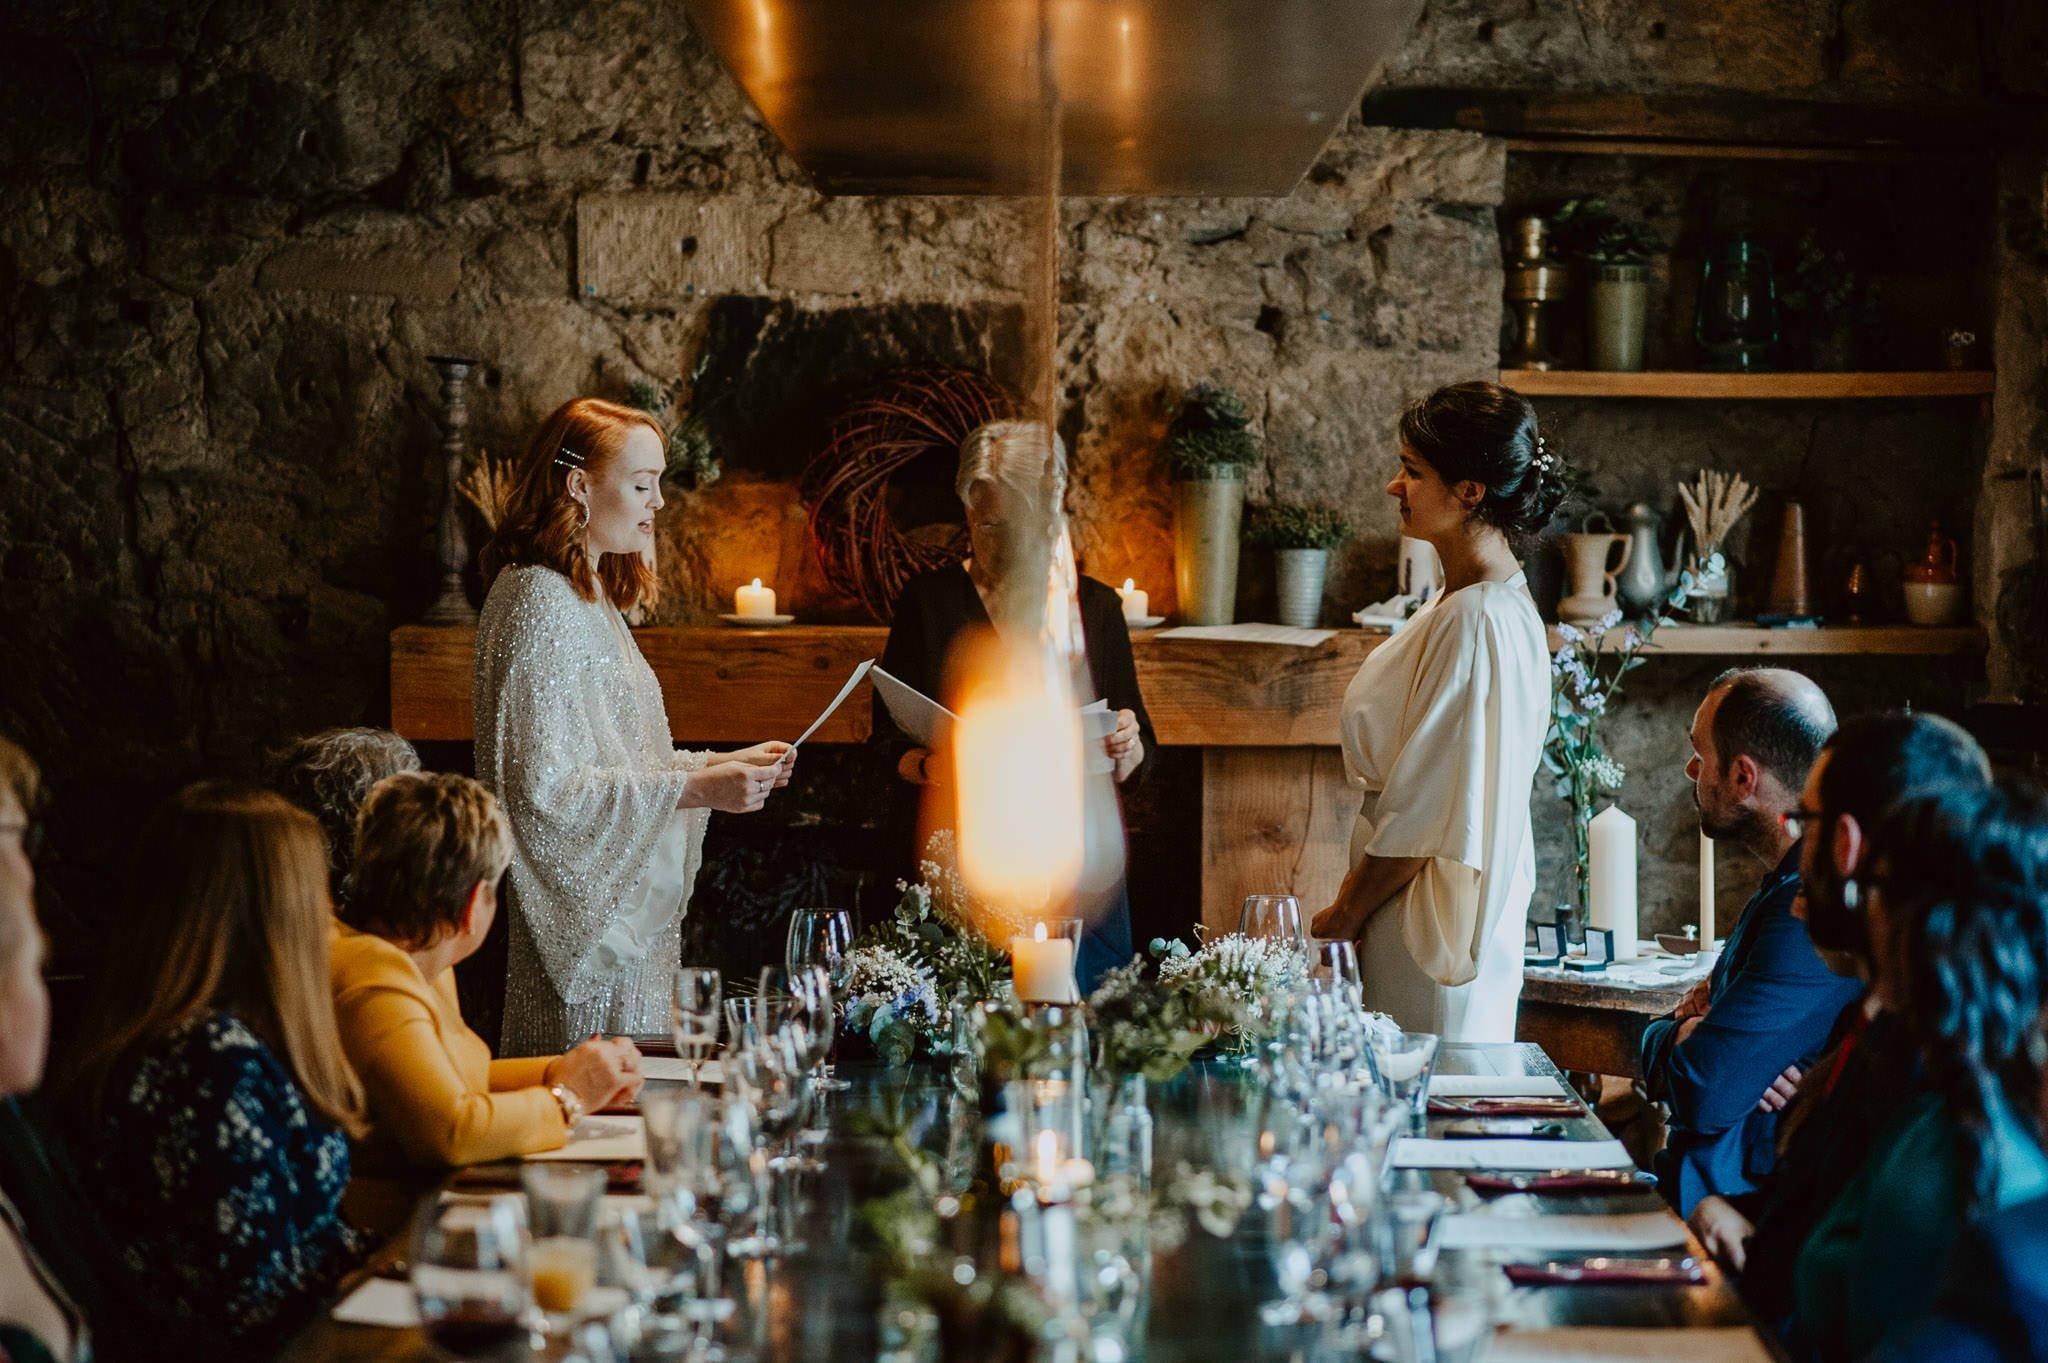 A Dreamy Pre-Raphaelite Wedding at the Bothy in Glasgow 24